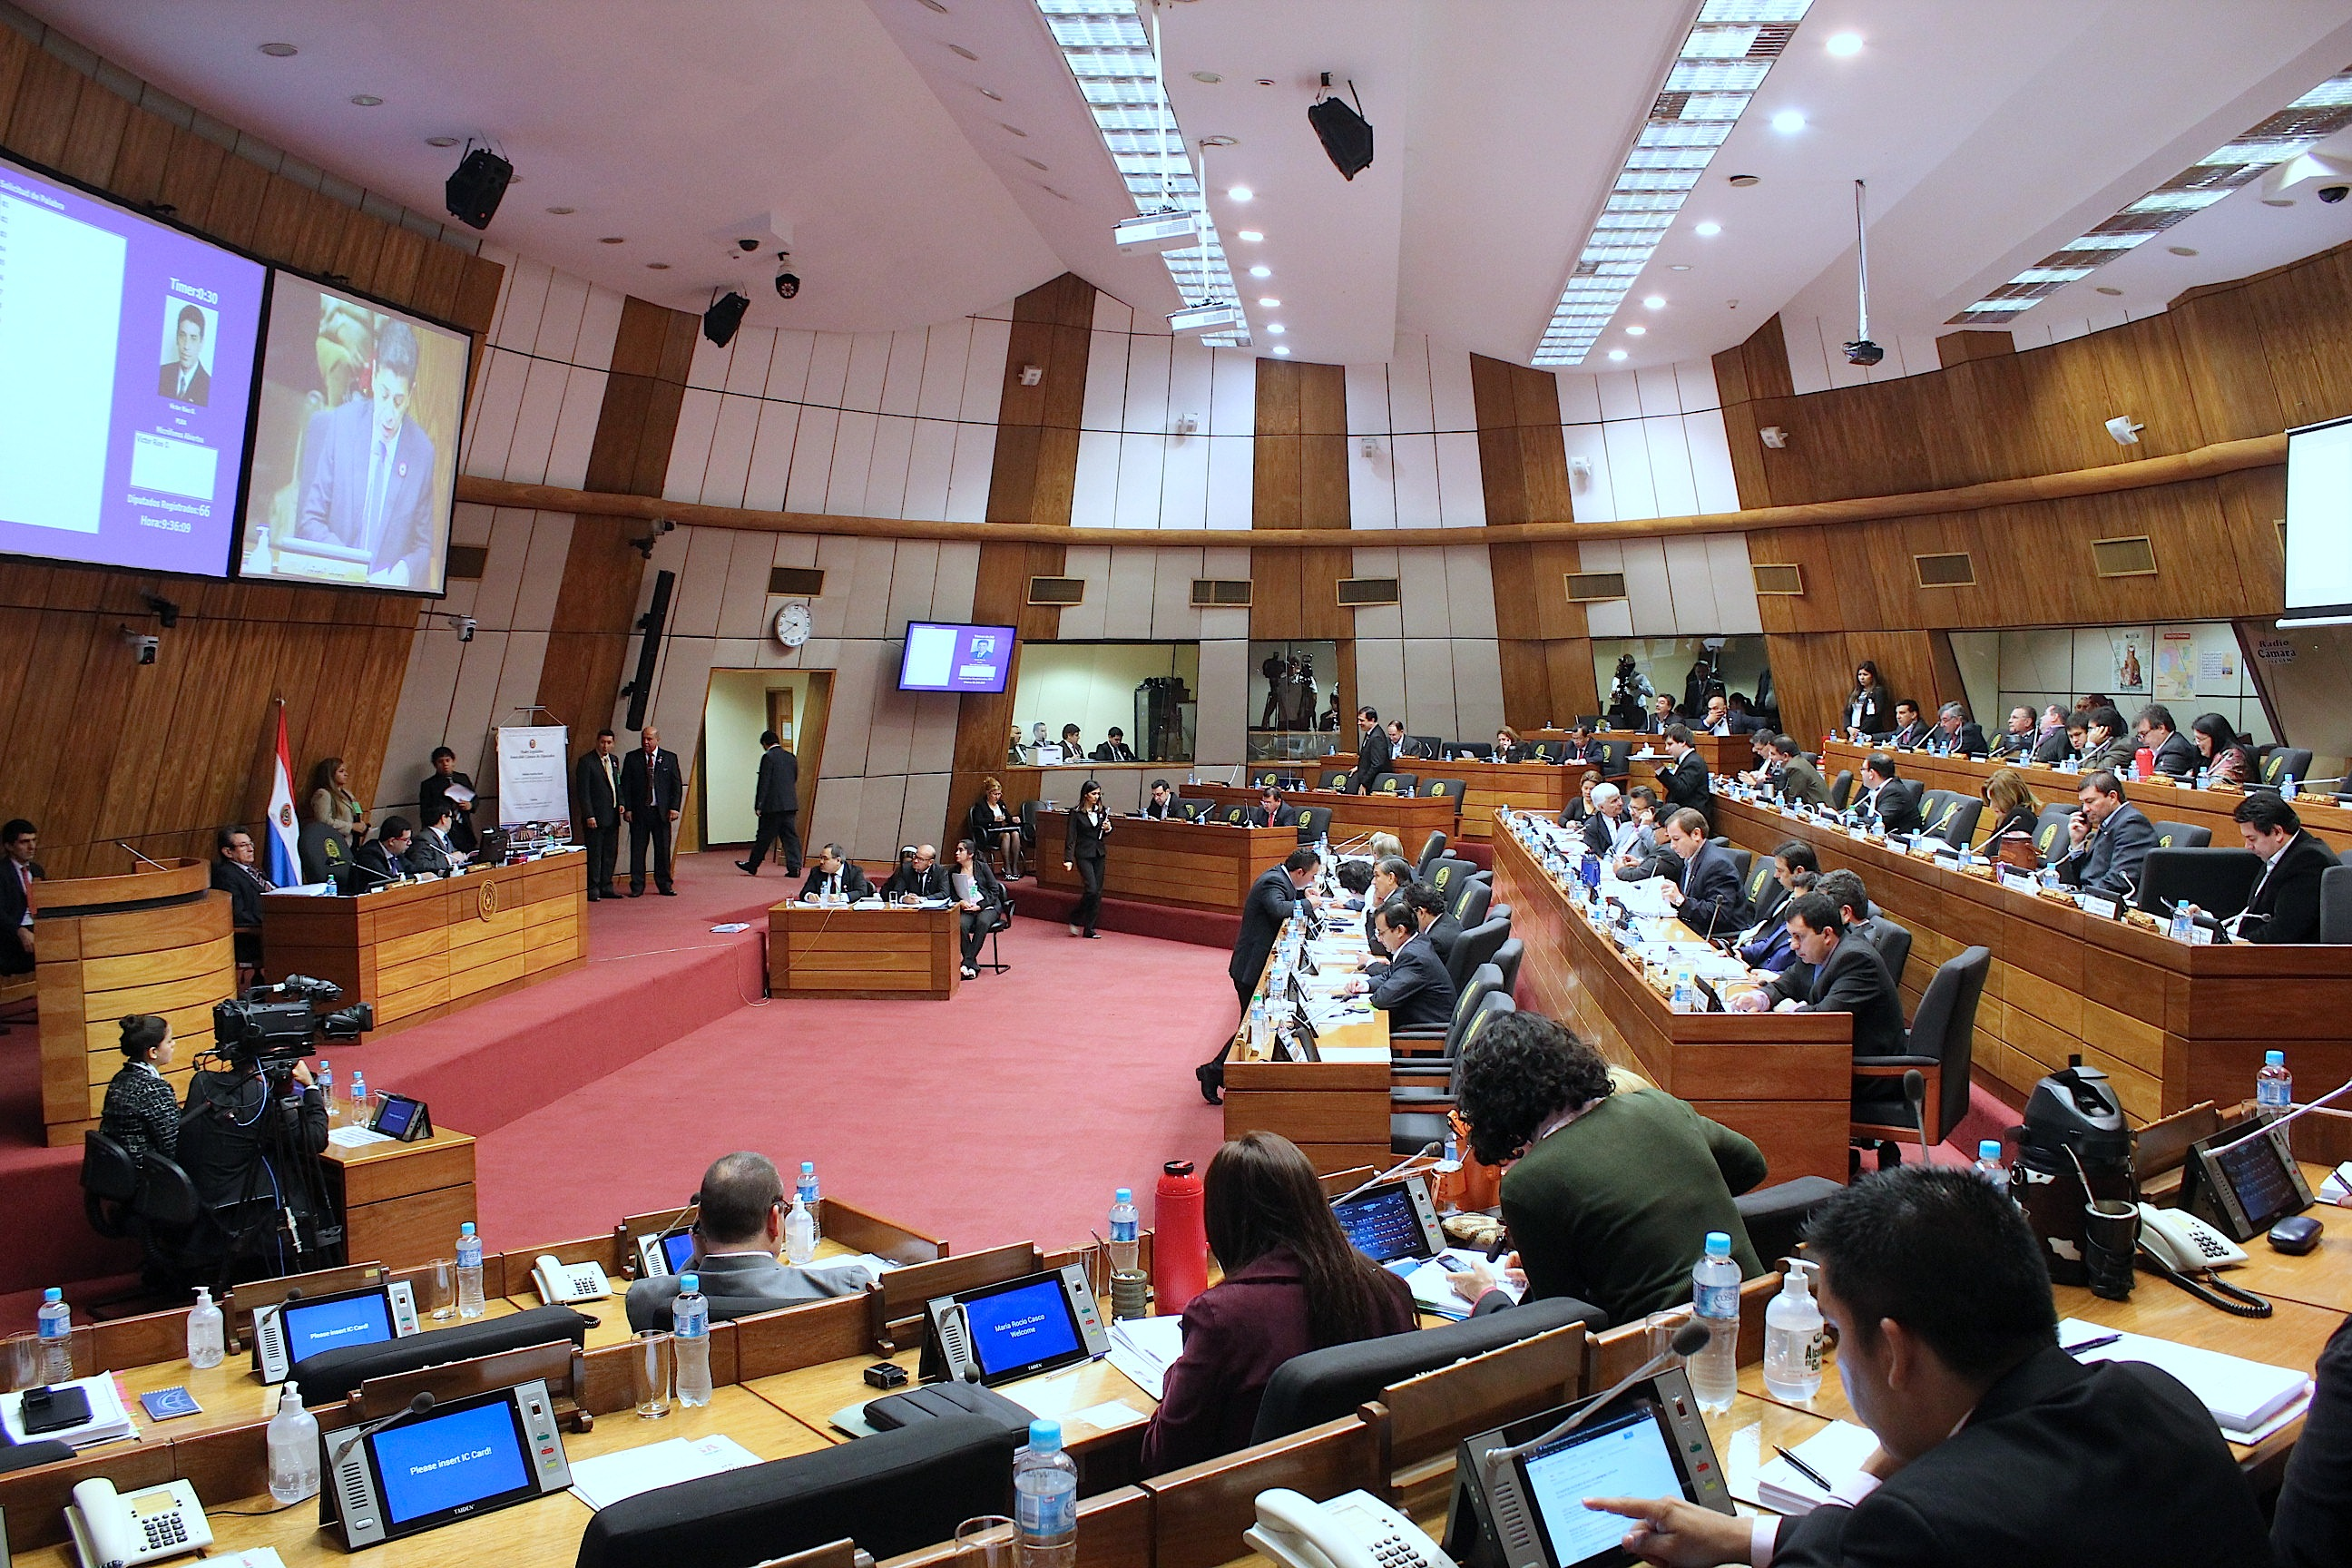 Chamber of Deputies of Paraguay